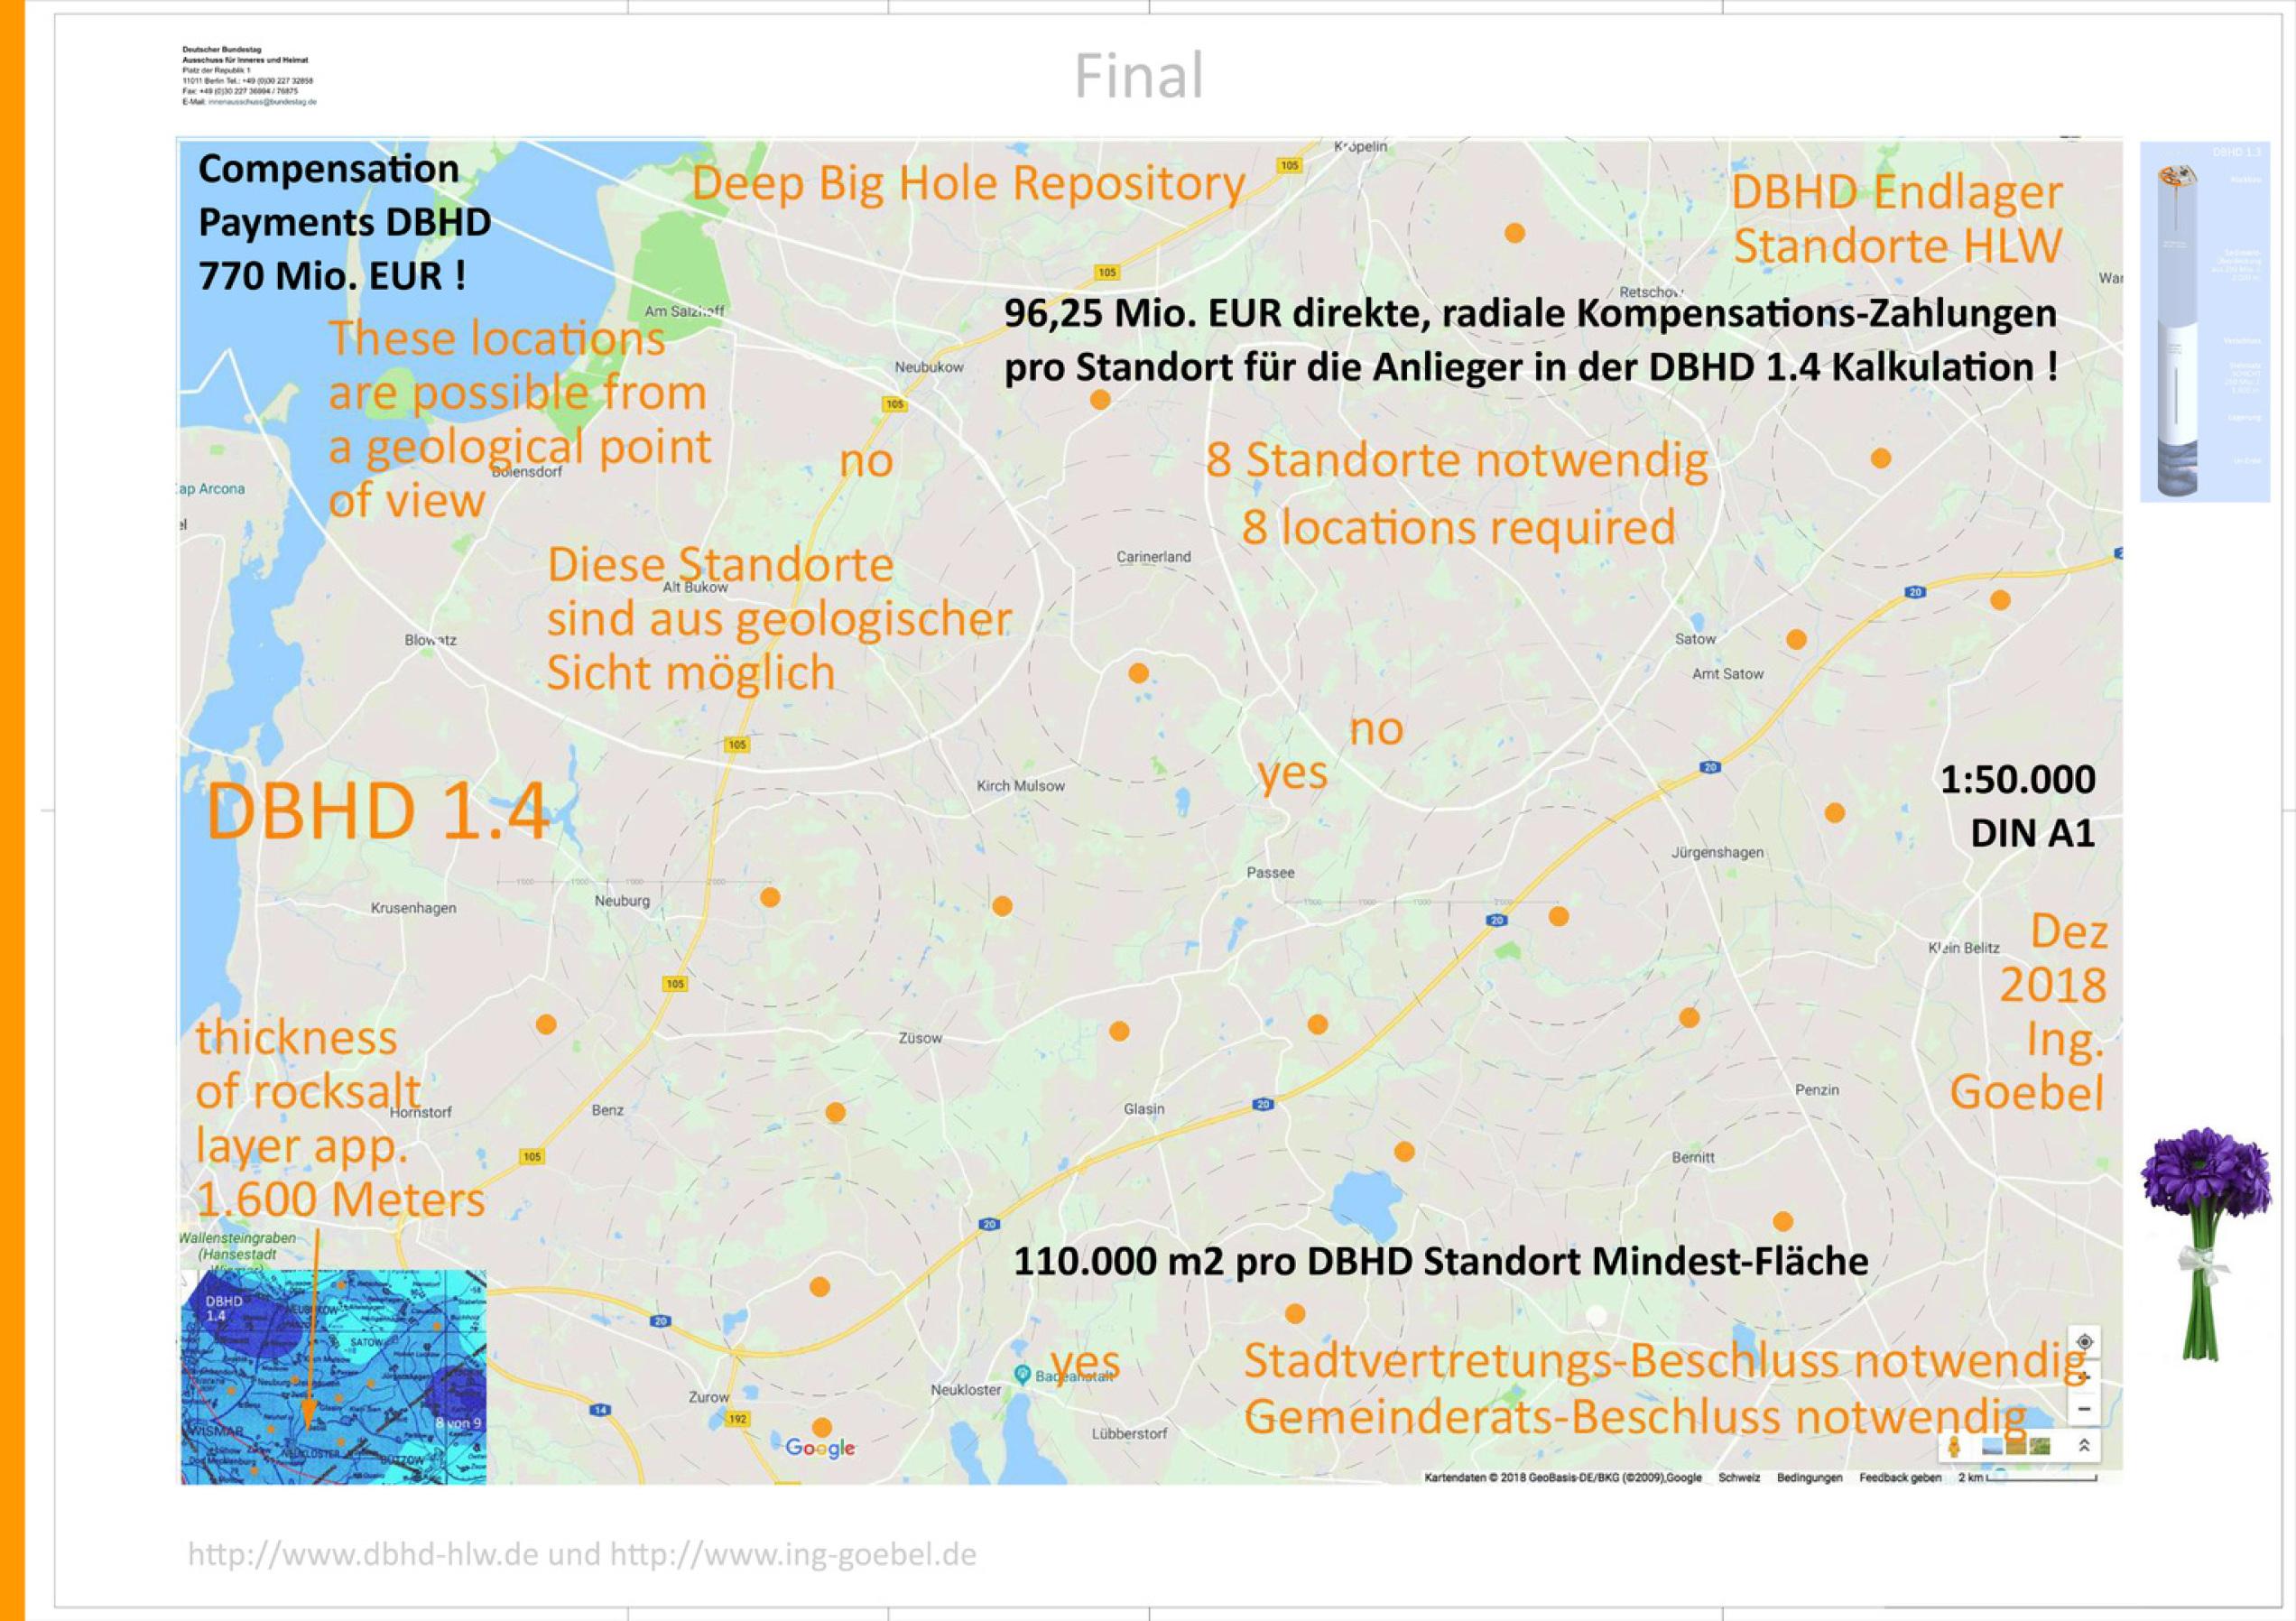 DBHD_1.4_Endlager_Standorte_Kompensationsradien_Karte_ing_Goebel_Basis_Geologische_Karte_auf_Strassenkarte Volker Goebel Endlager